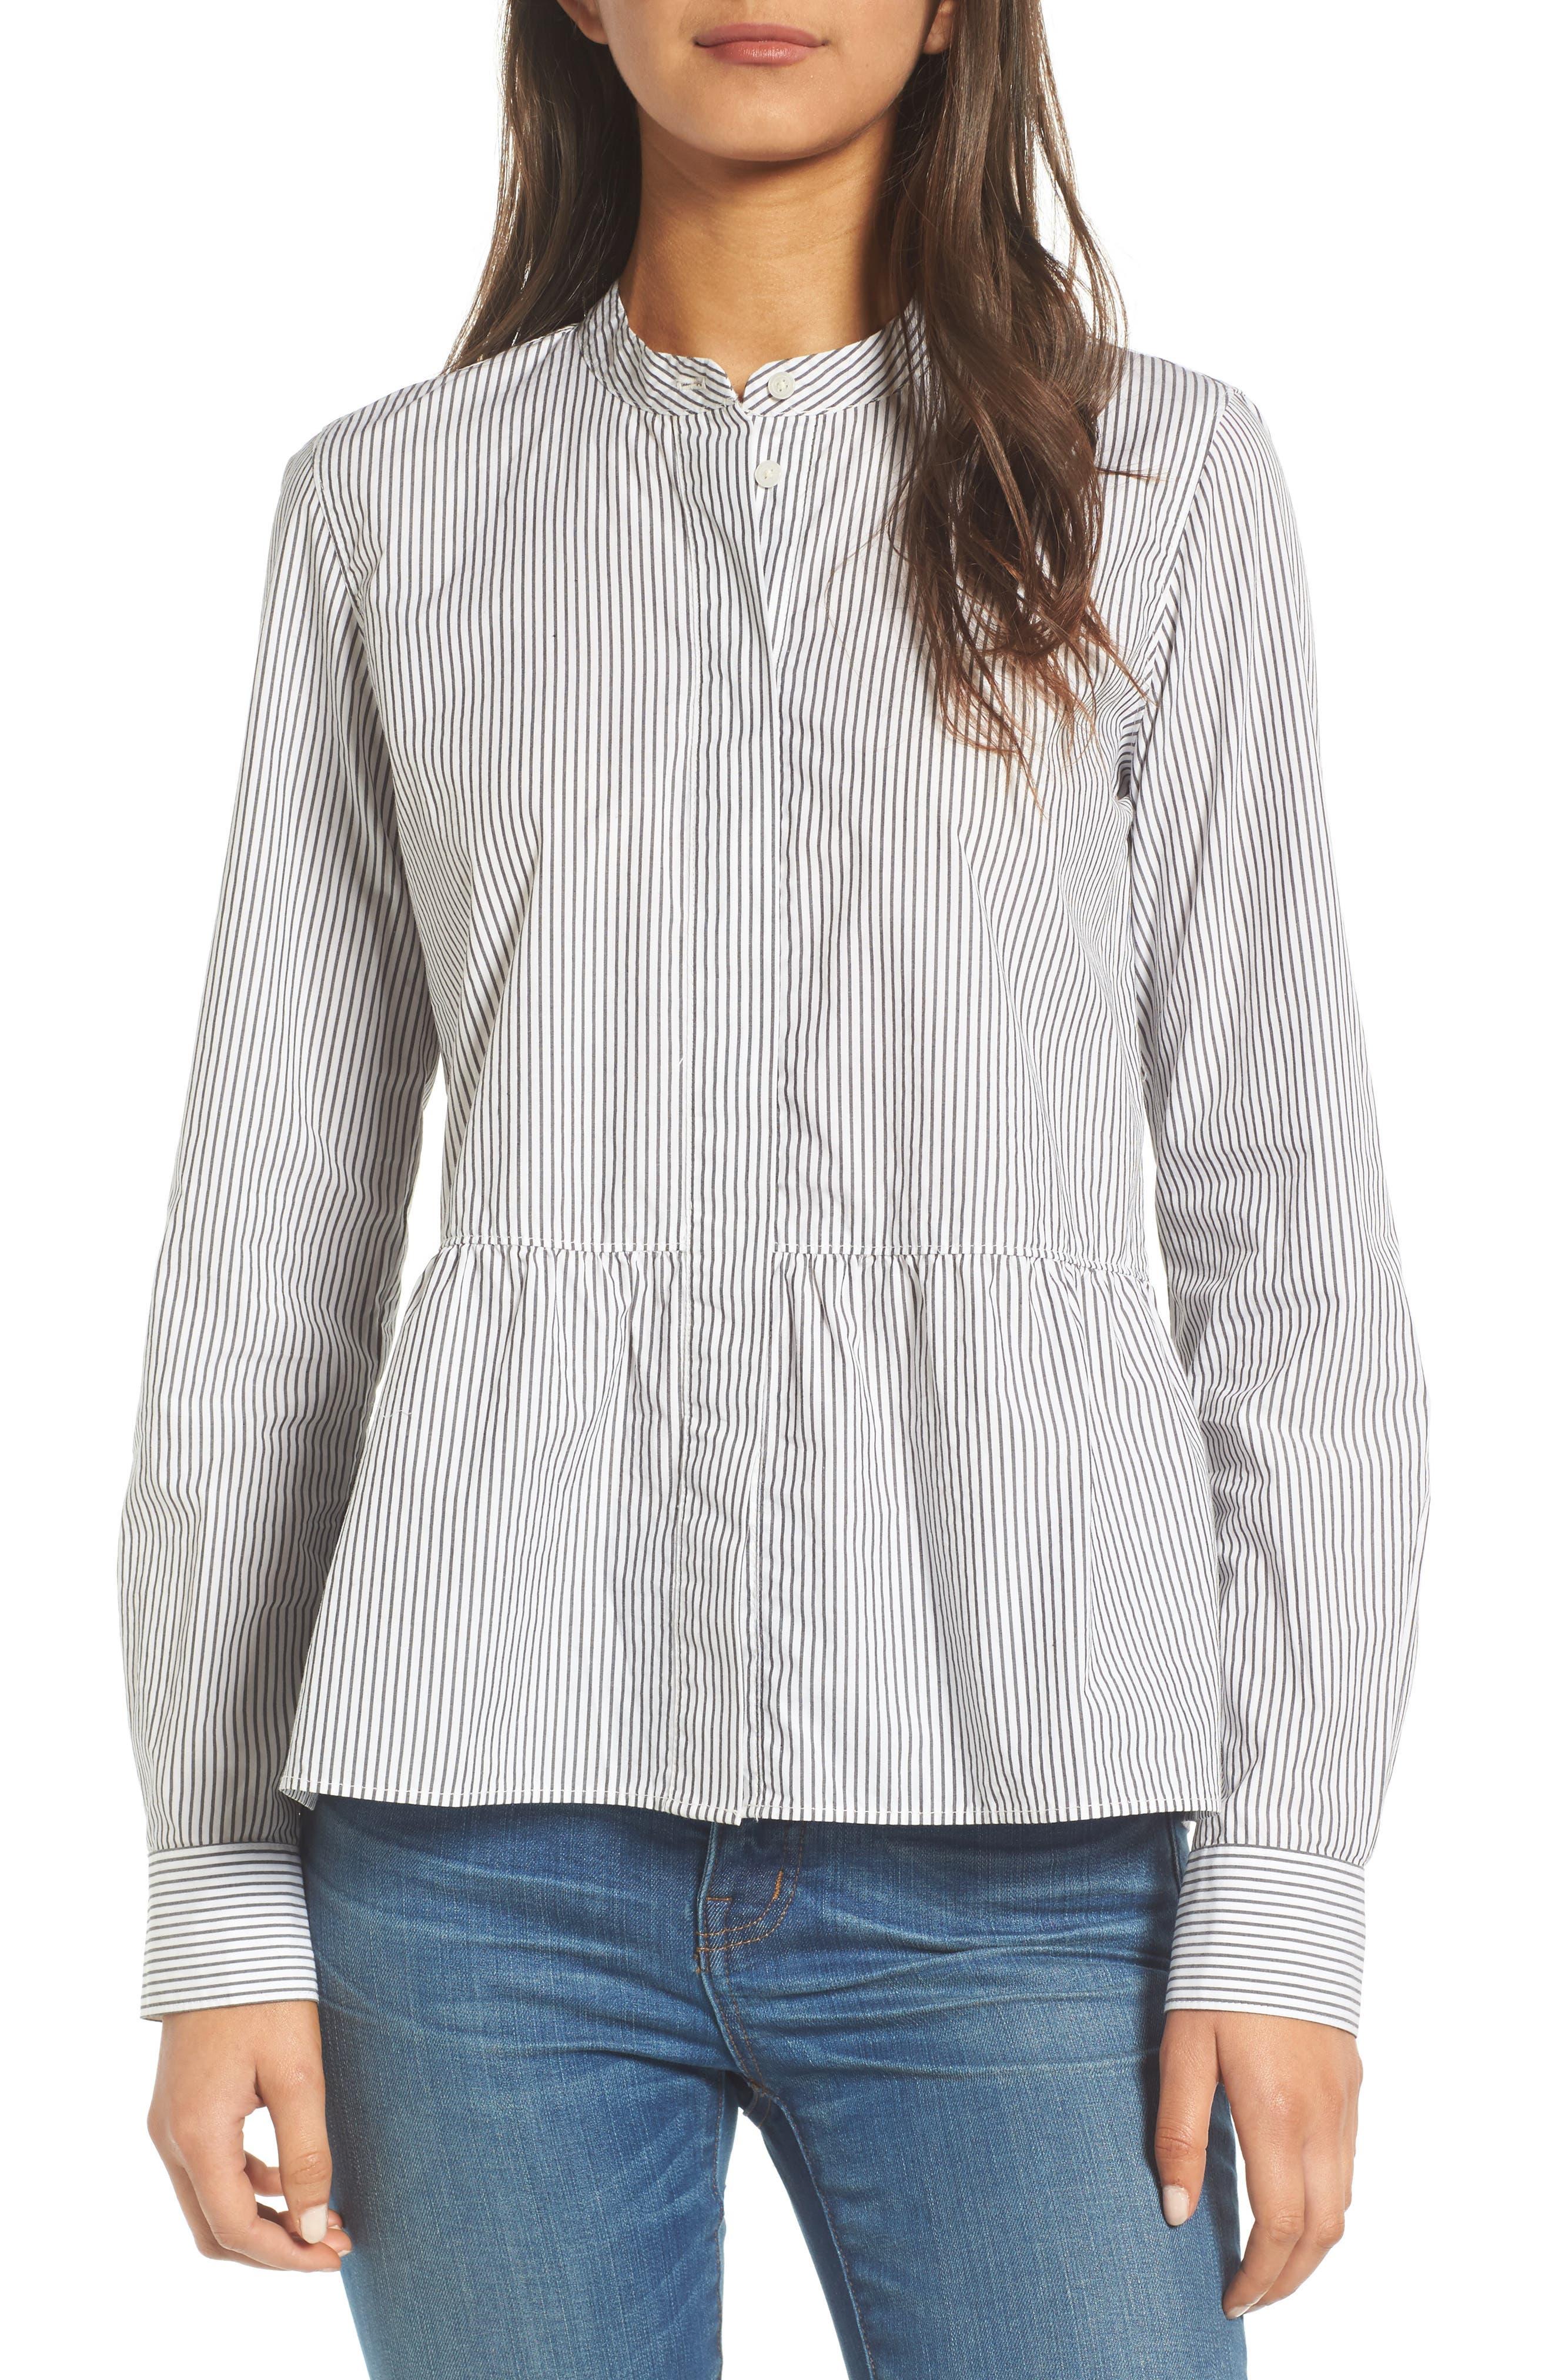 Alternate Image 1 Selected - Madewell Peplum Shirt